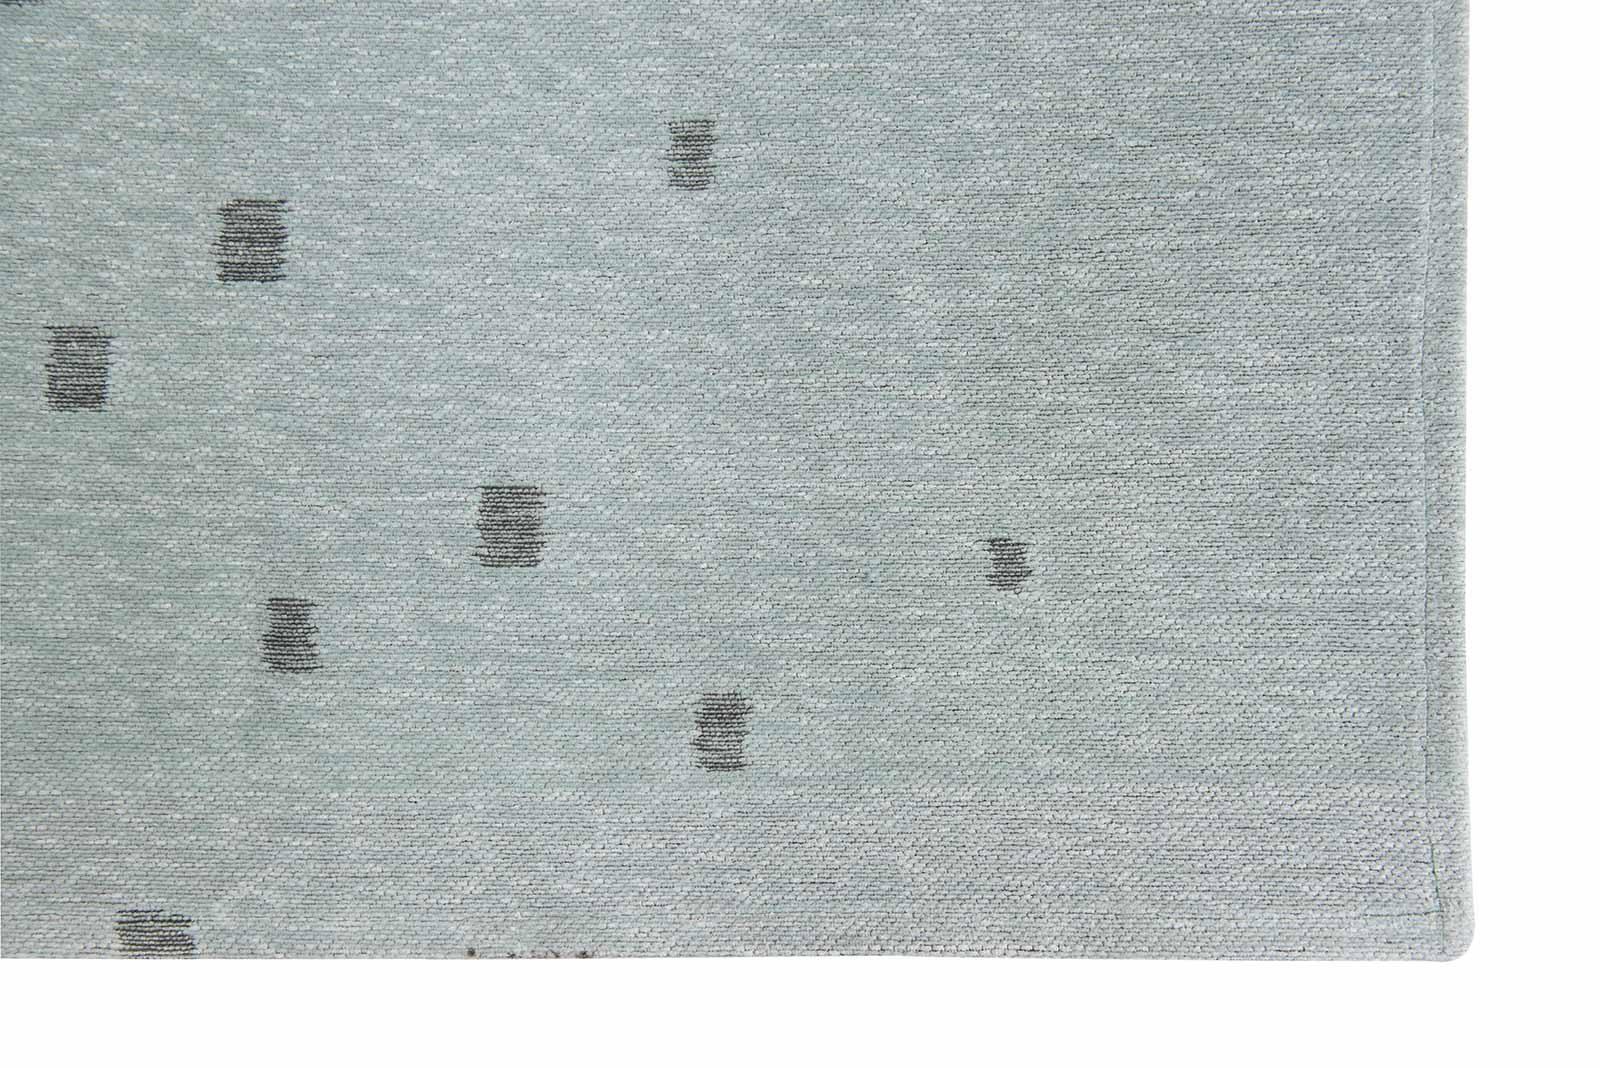 Louis De Poortere rugs Villa Nova LX 8778 Freyr Verdigris corner